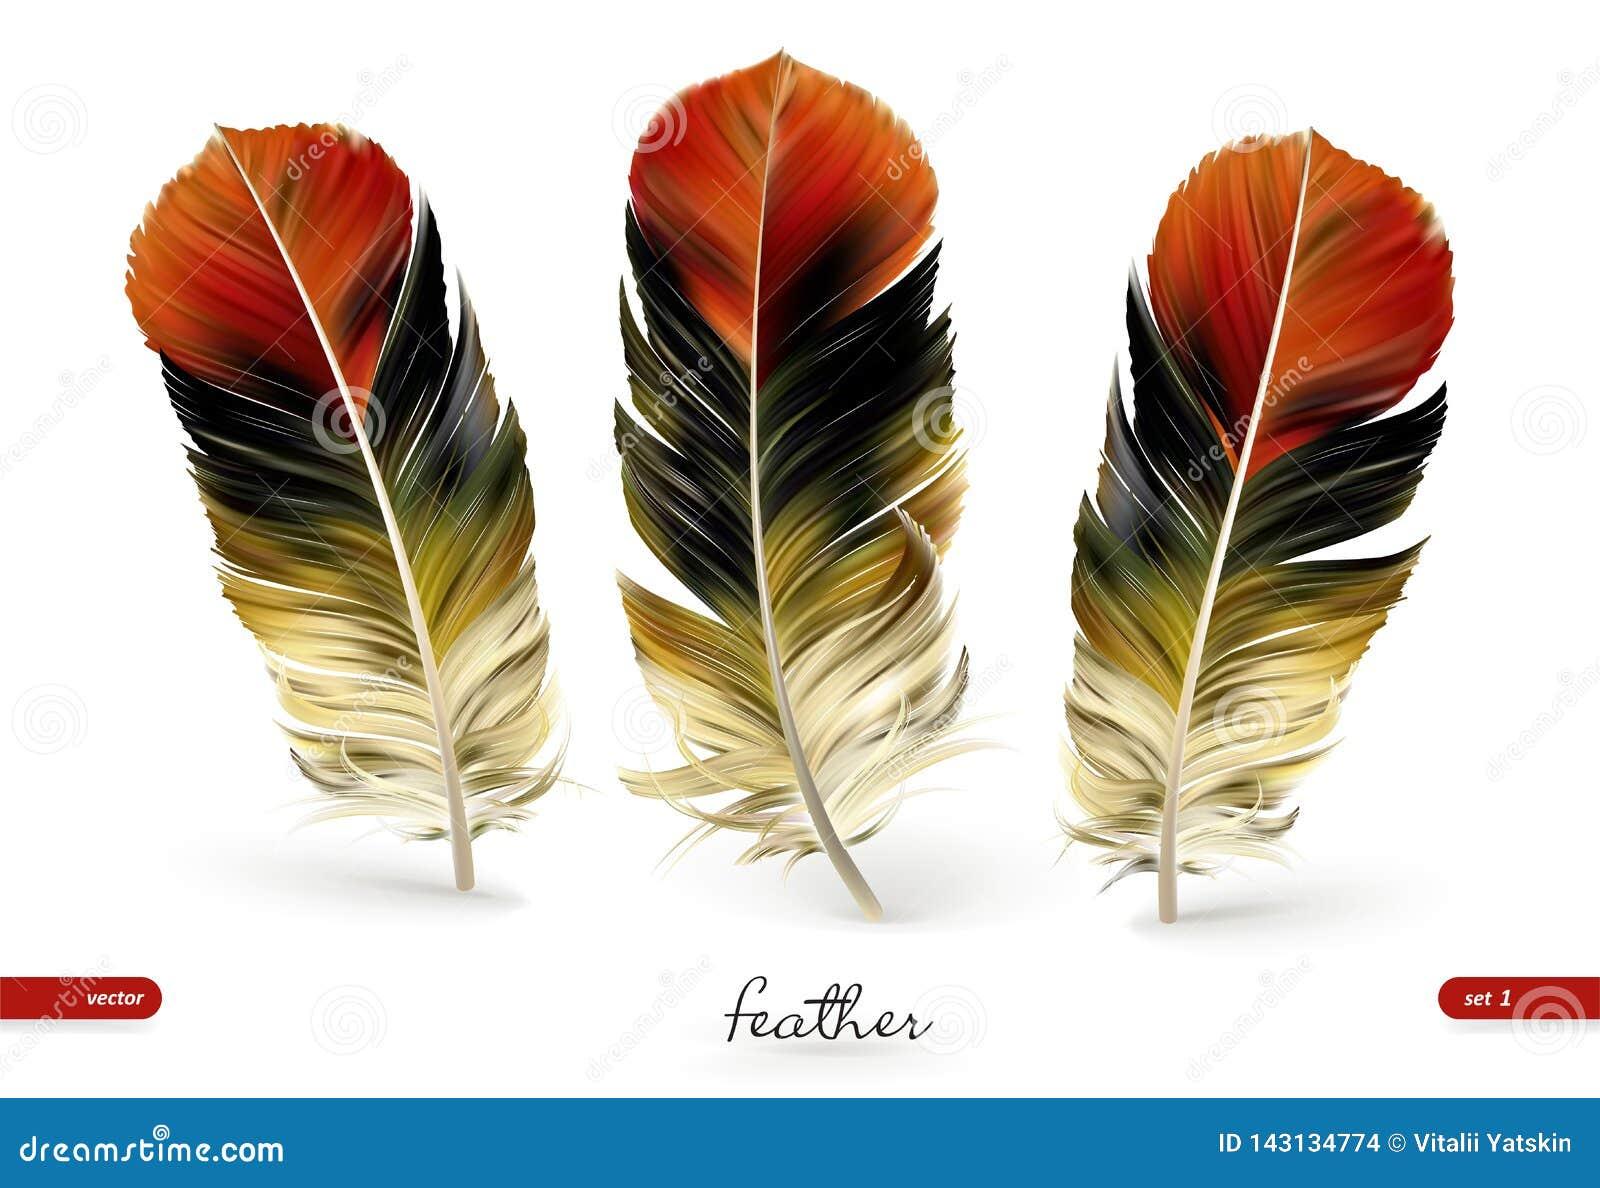 Set of realistic feathers - illustration. Isolated on white background